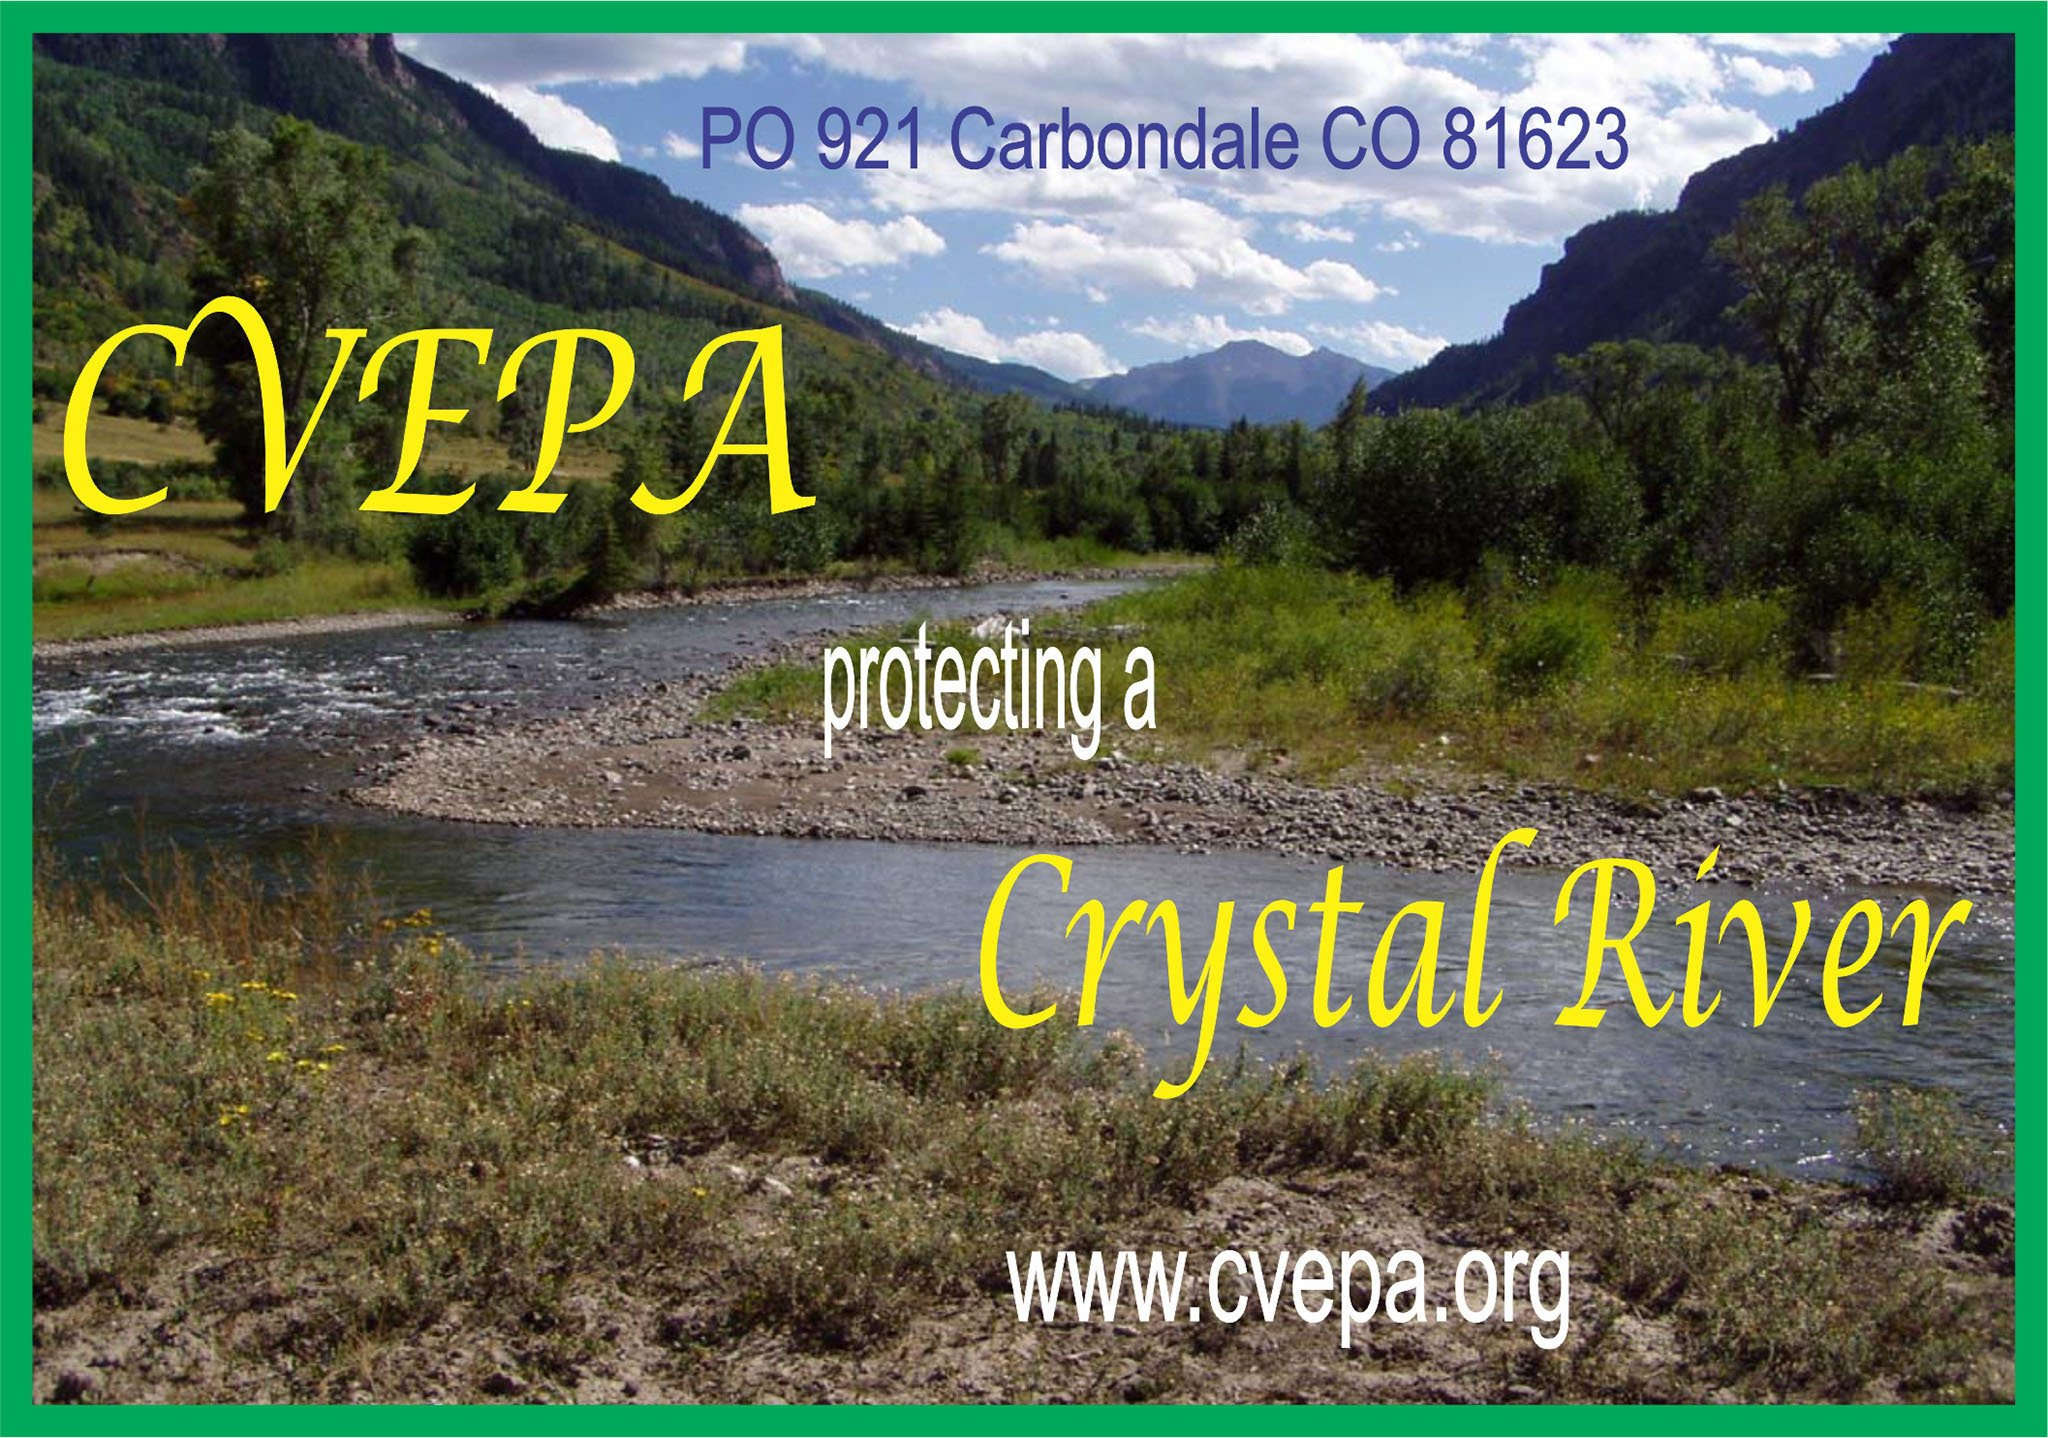 CVEPA thumbnail